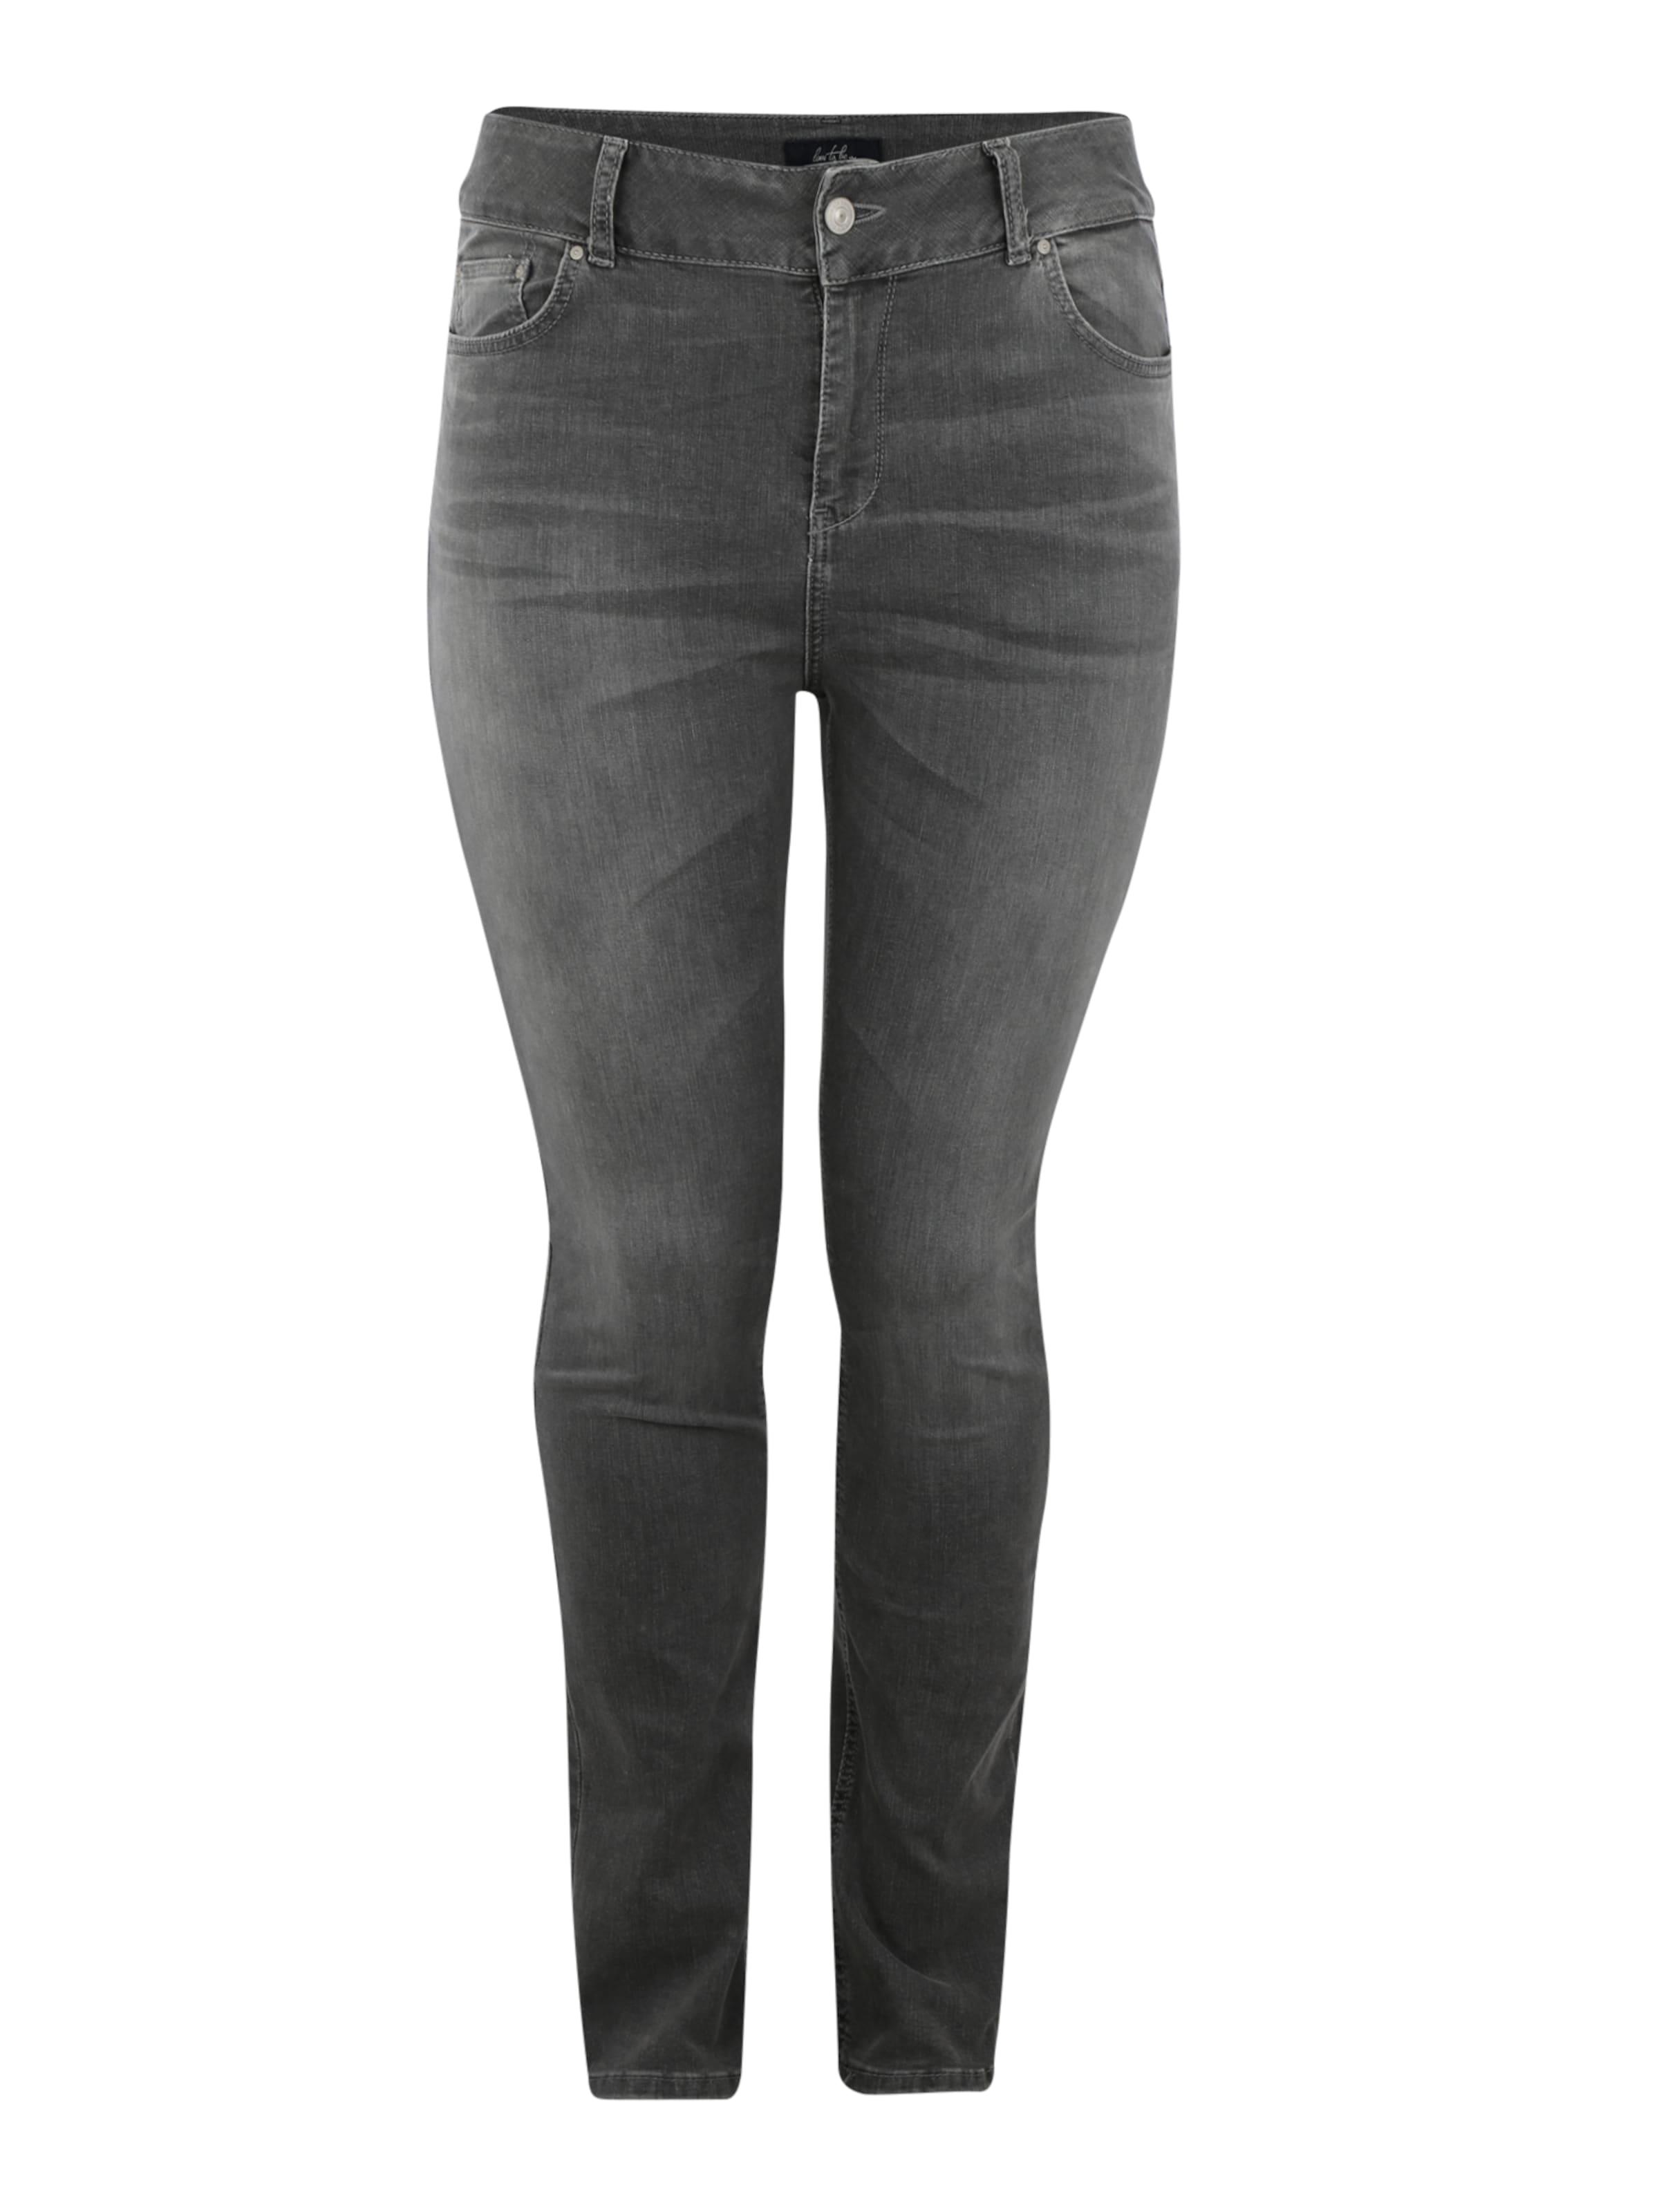 LtbLove To Jeans In Grey Be 'maren' Denim 4jAR5L